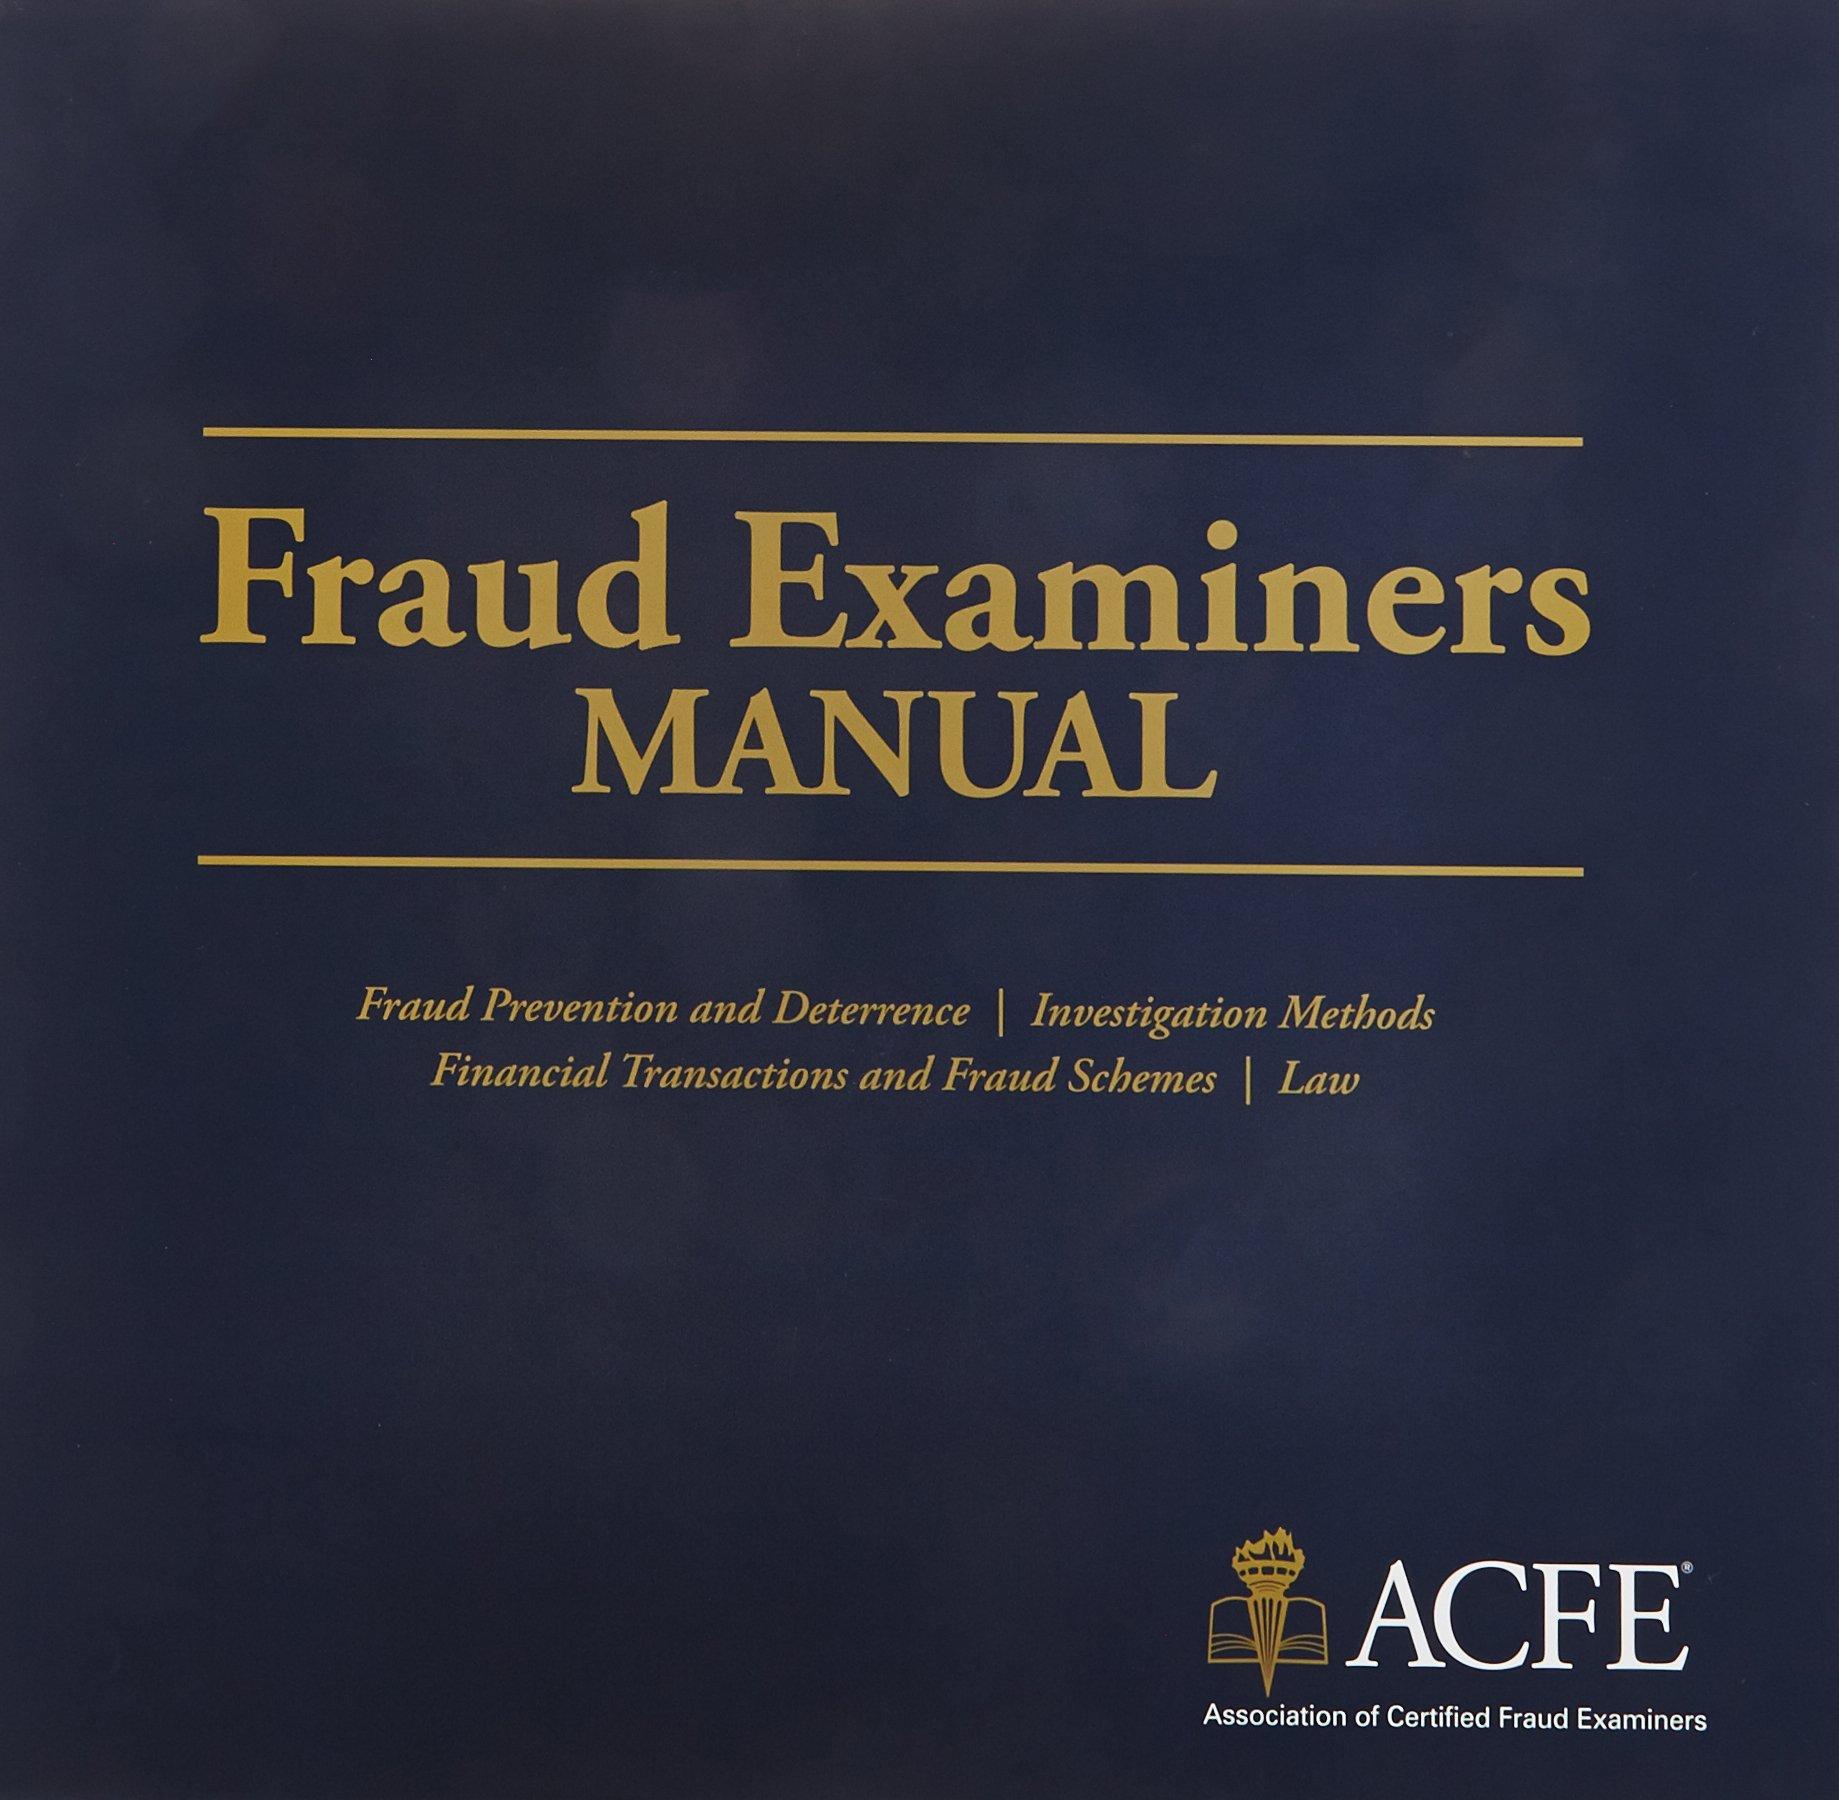 Amazon buy fraud examiners manual book online at low prices in amazon buy fraud examiners manual book online at low prices in india fraud examiners manual reviews ratings 1betcityfo Images